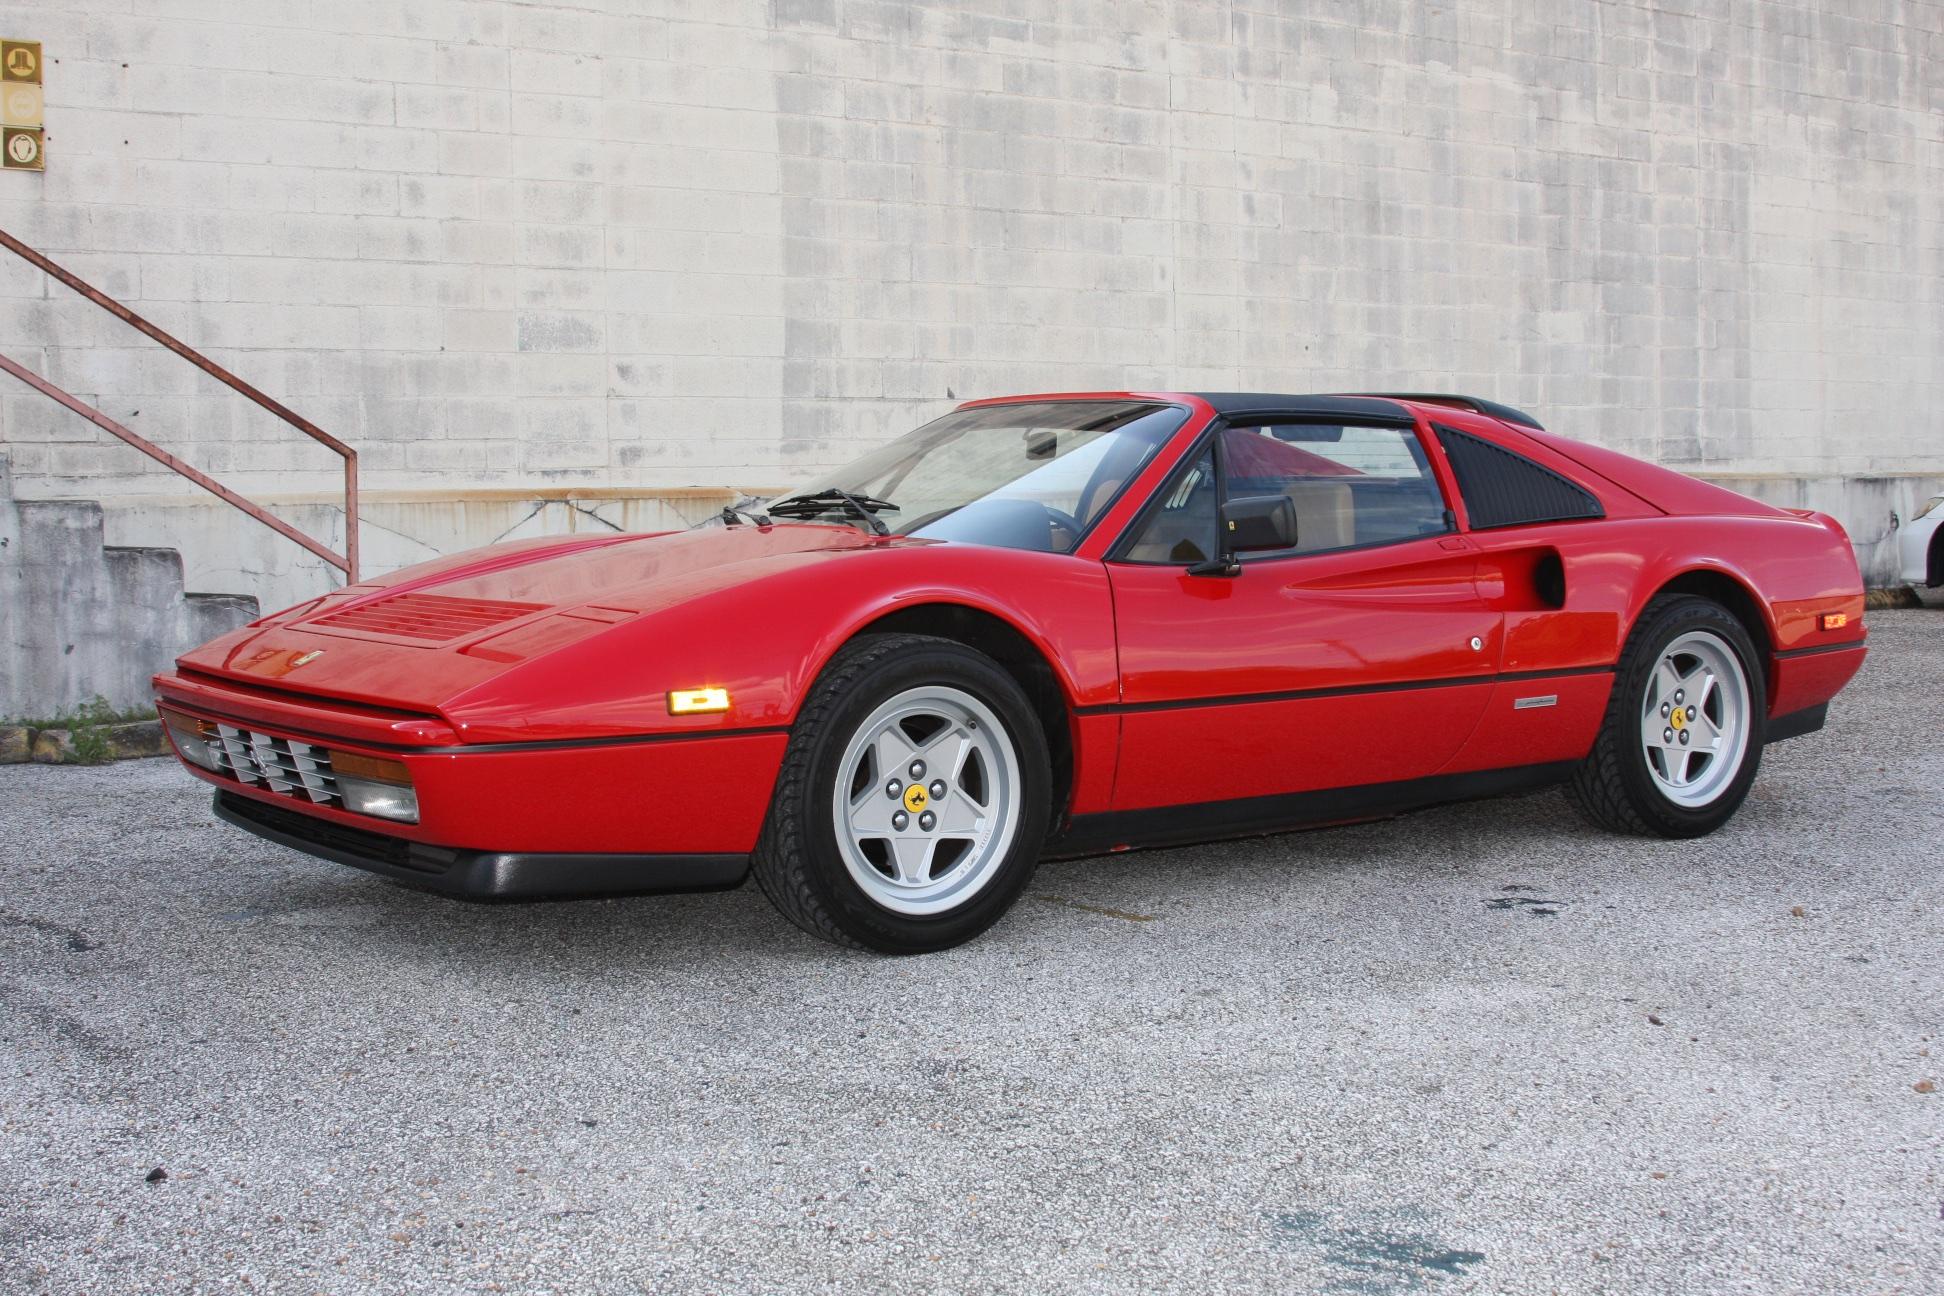 1988 Ferrari 328 GTS (J0075955) 7.jpg